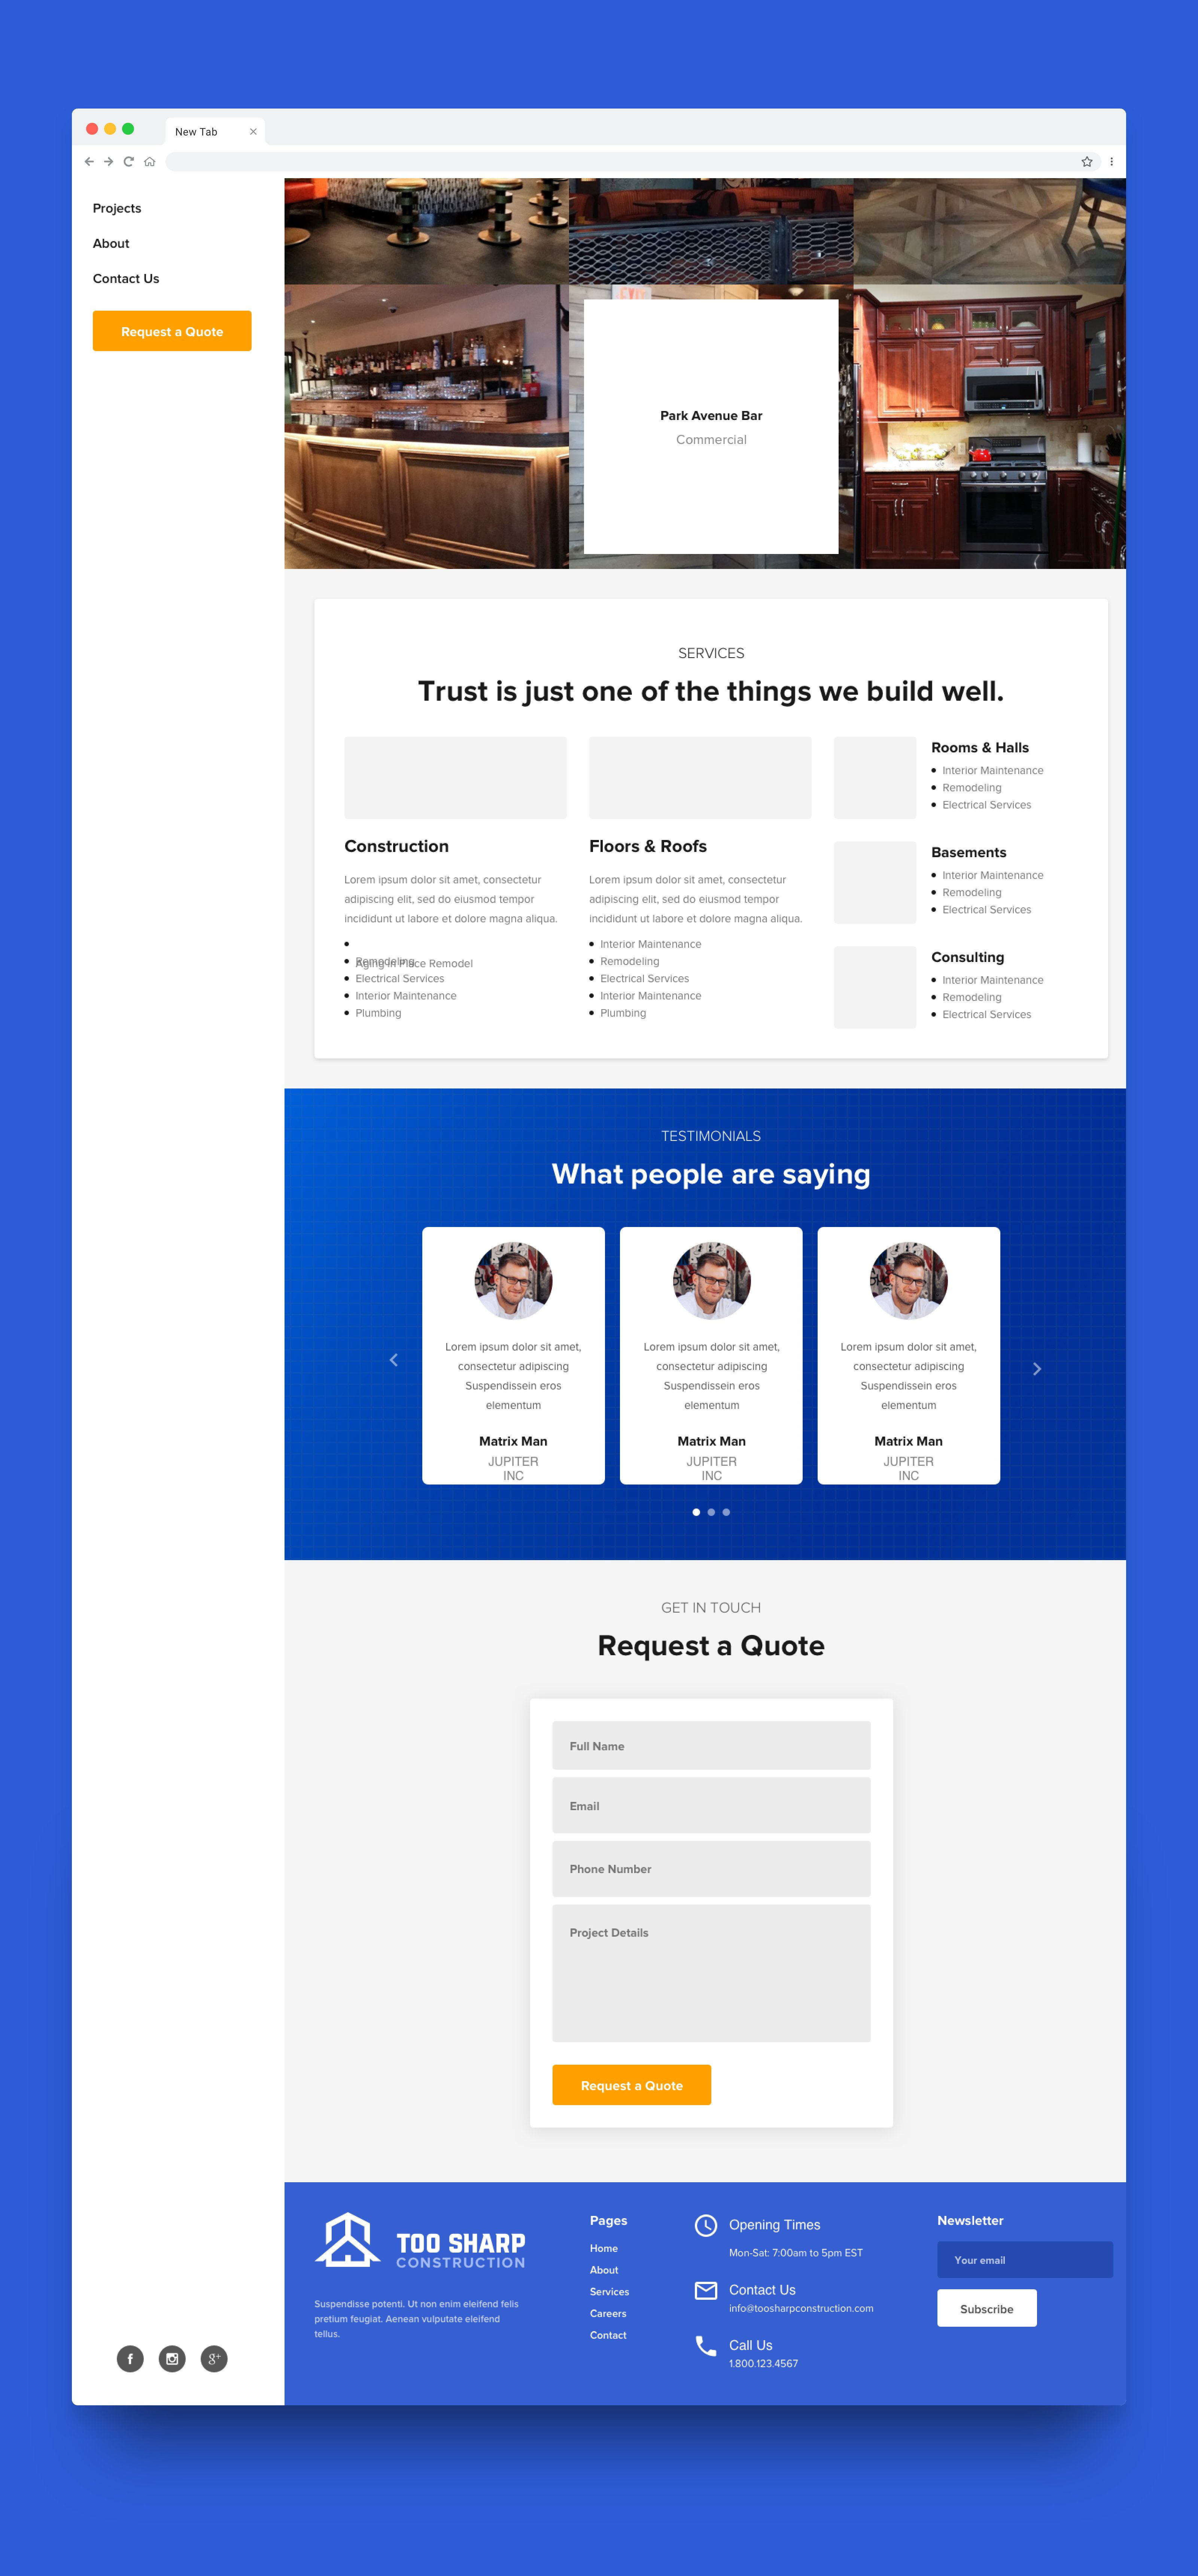 Full Screenshot of Too Sharp Construction Website